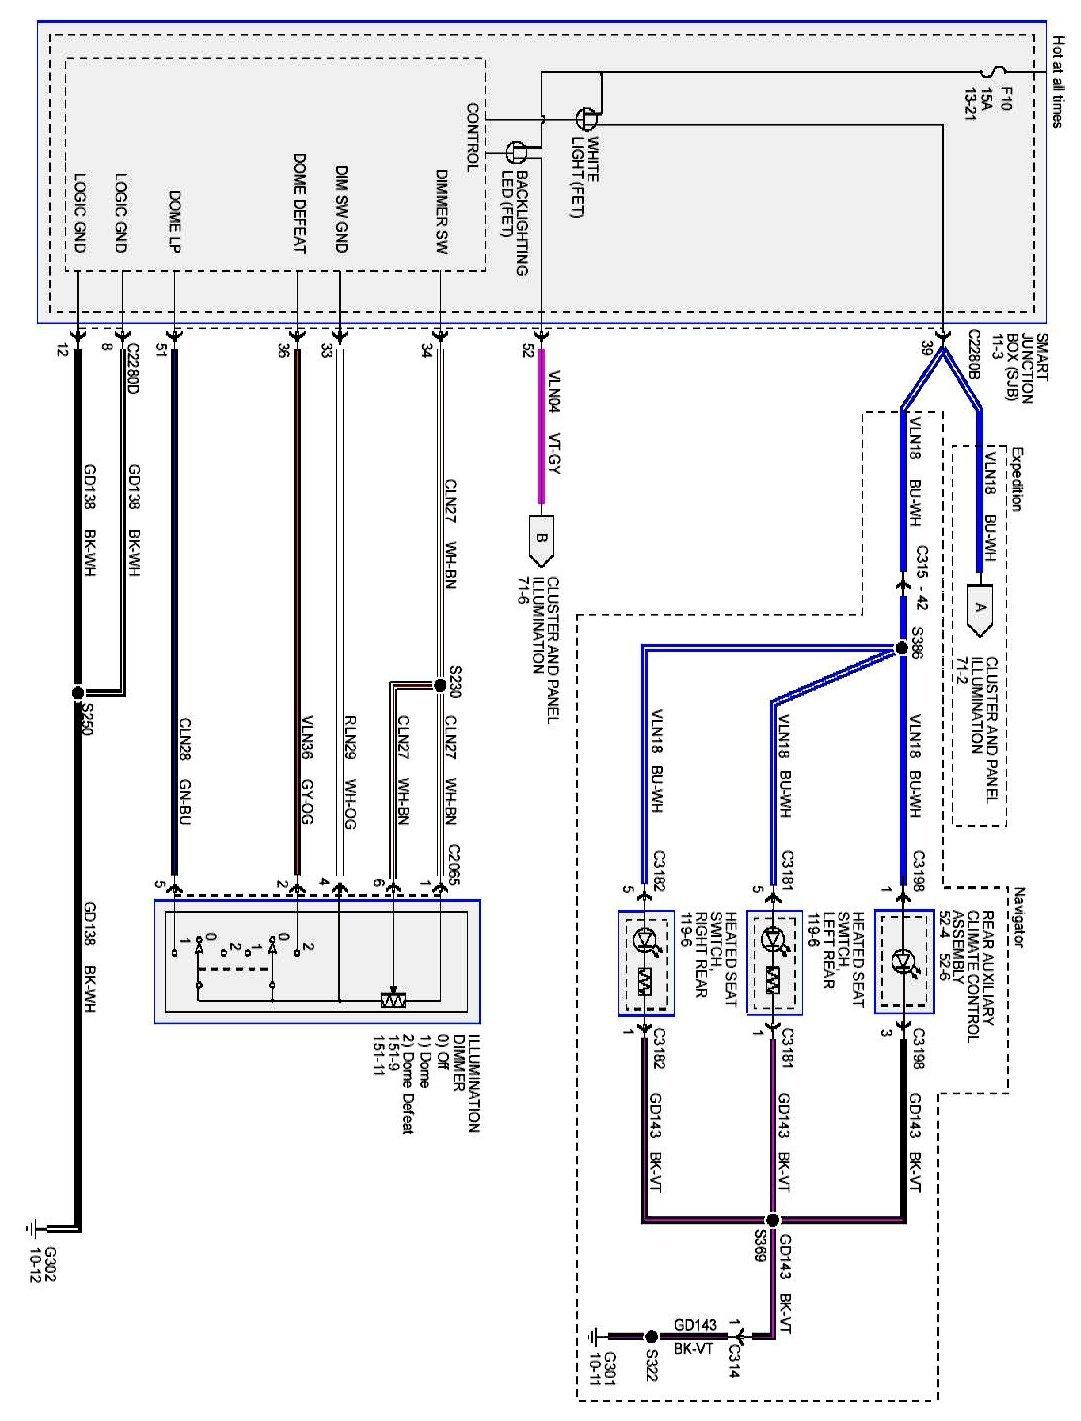 ae6ca920-d7df-4841-96ff-36f899cc503b_interior.jpg